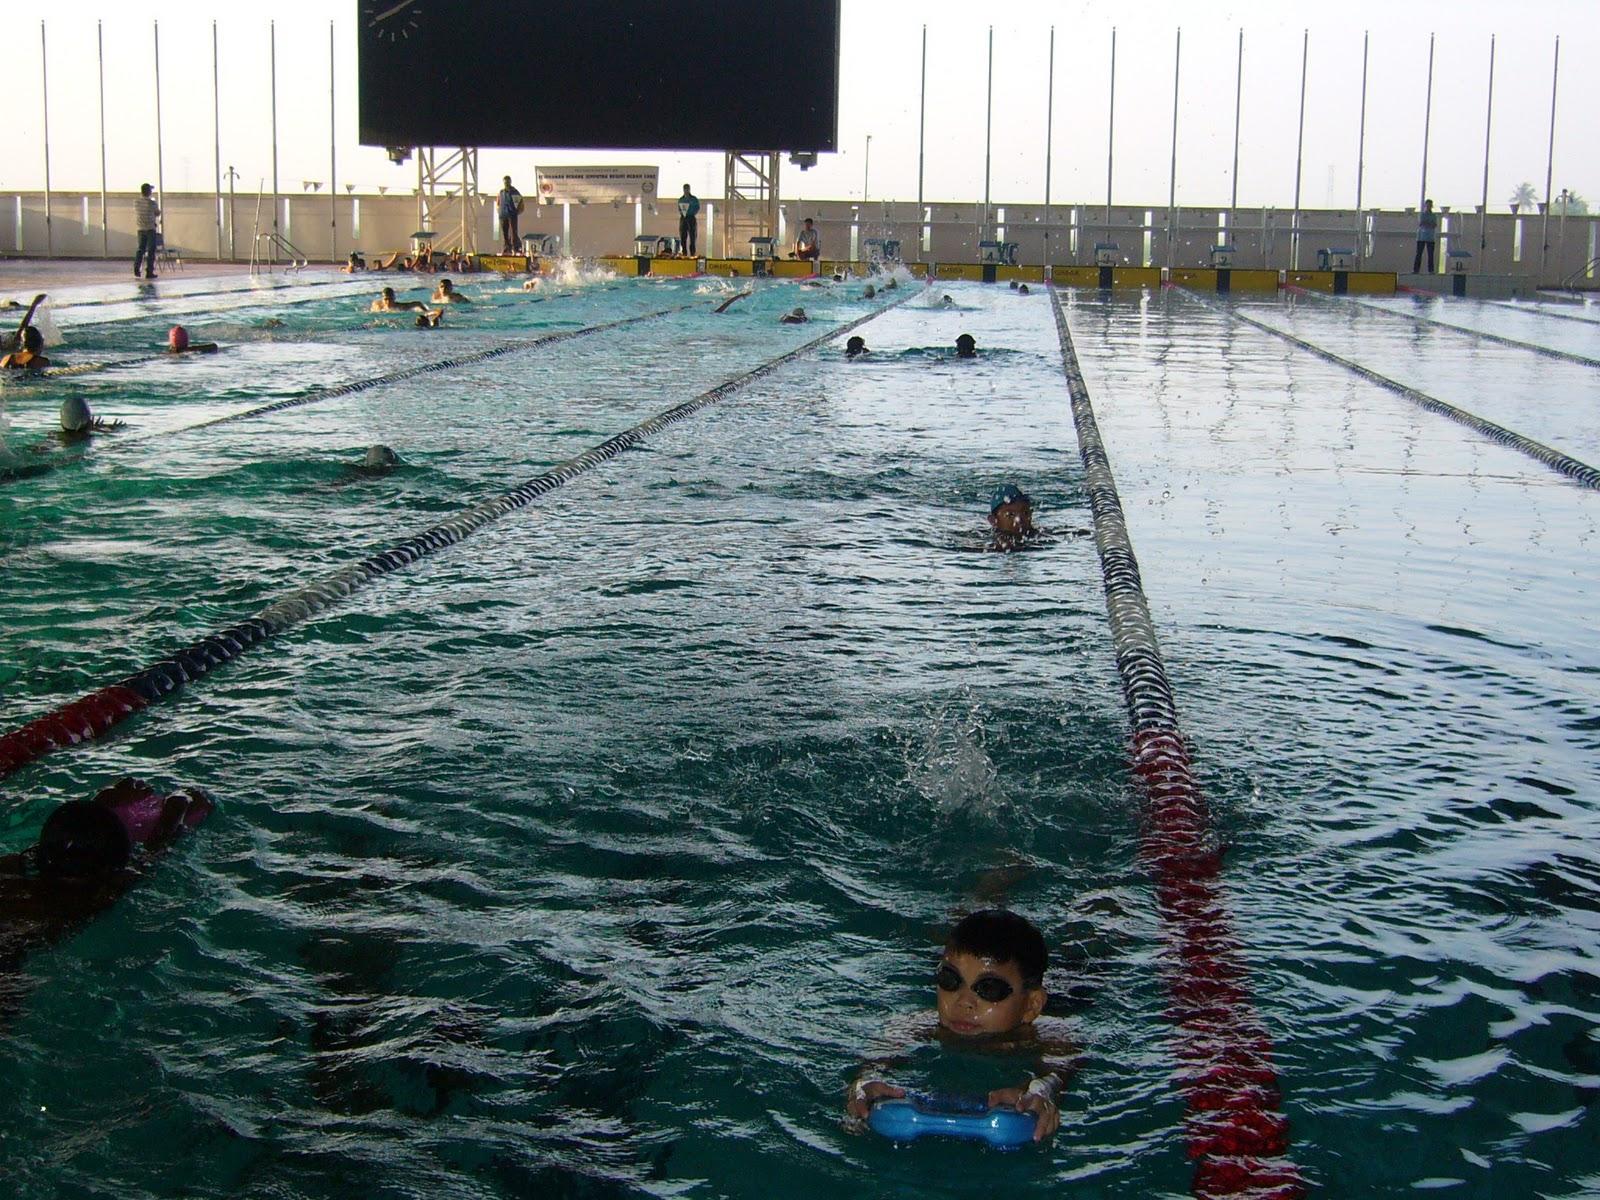 Marinestars swimming team mst penang malaysia august - Seberang jaya public swimming pool ...